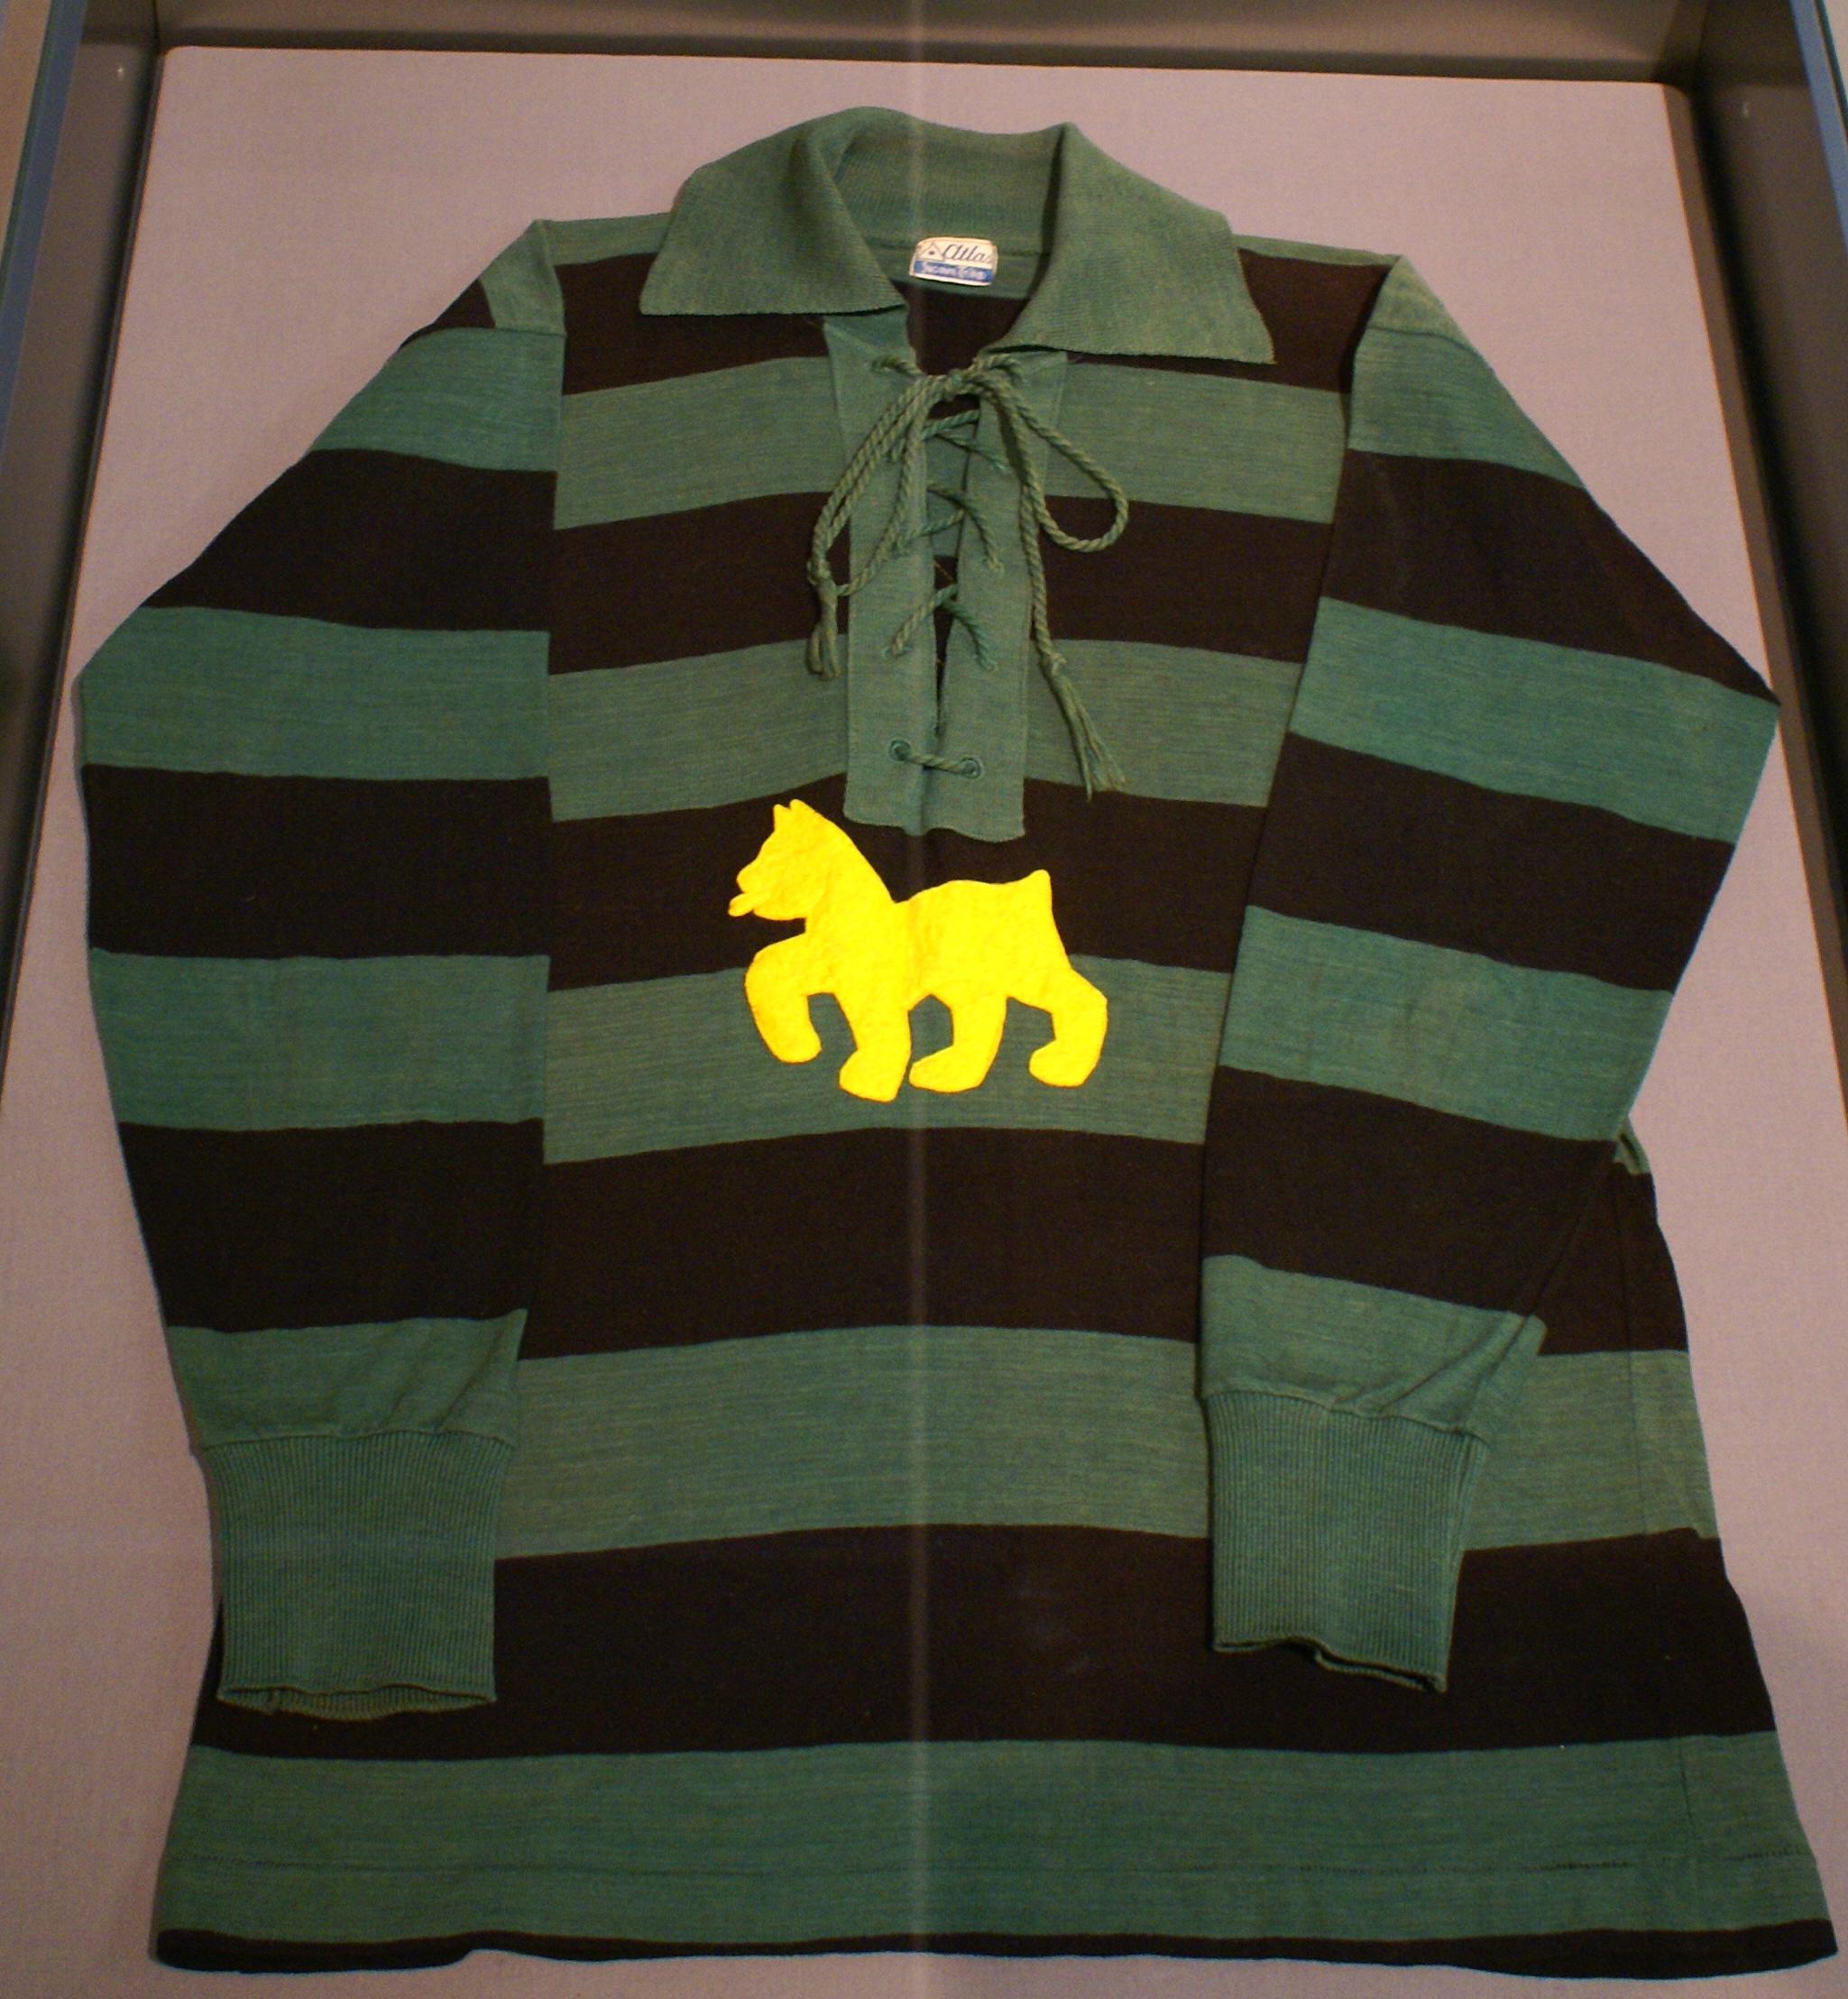 Jersey Kleidung Wikipedia